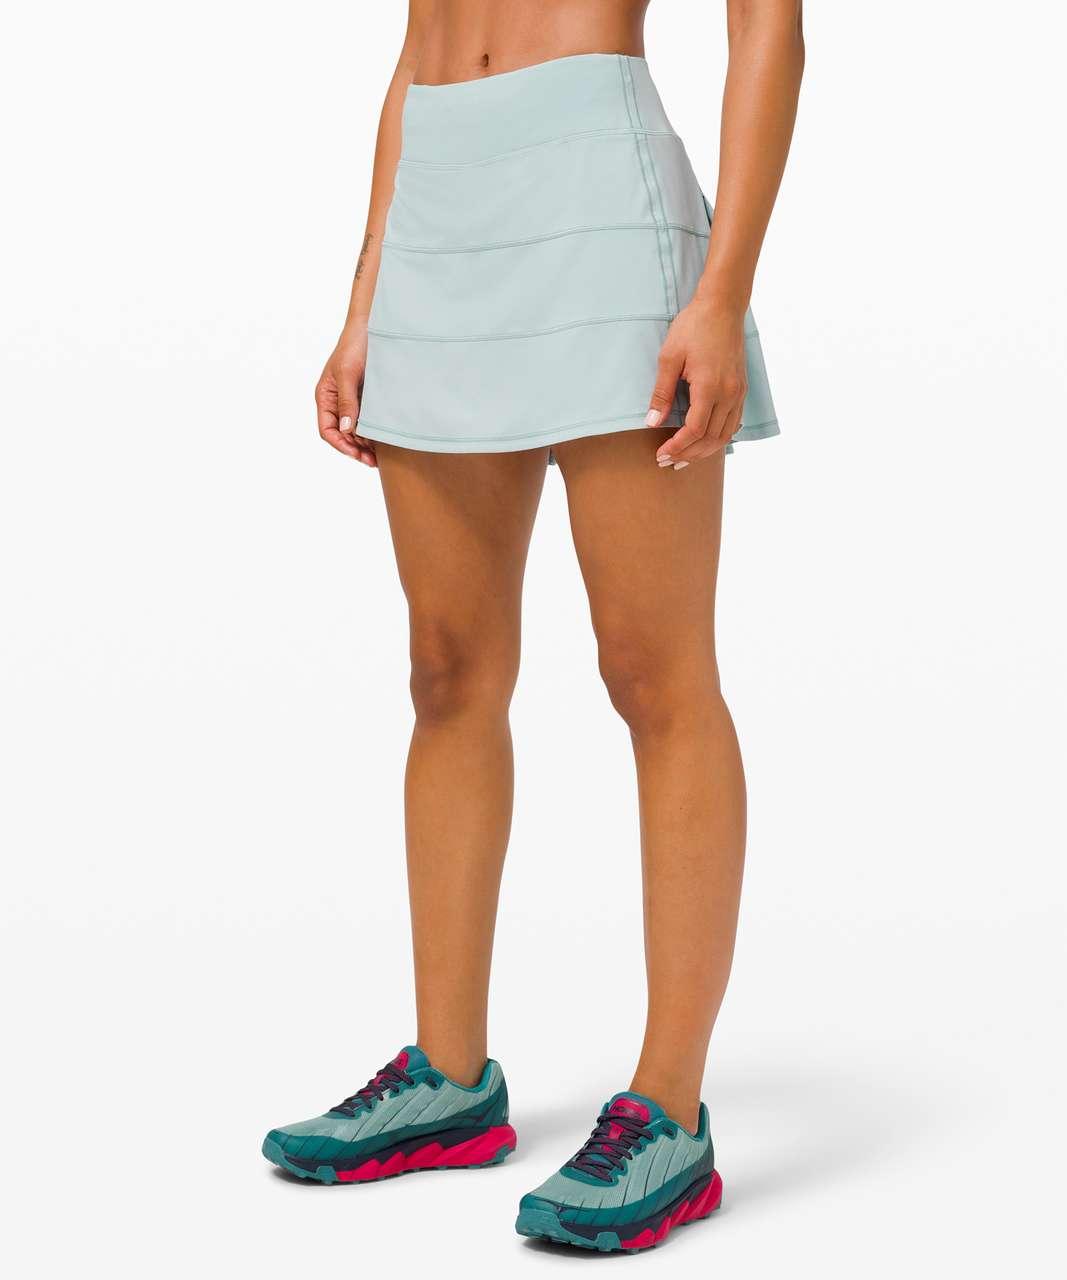 "Lululemon Pace Rival Skirt (Tall) *4-way Stretch 15"" - Hazy Jade"